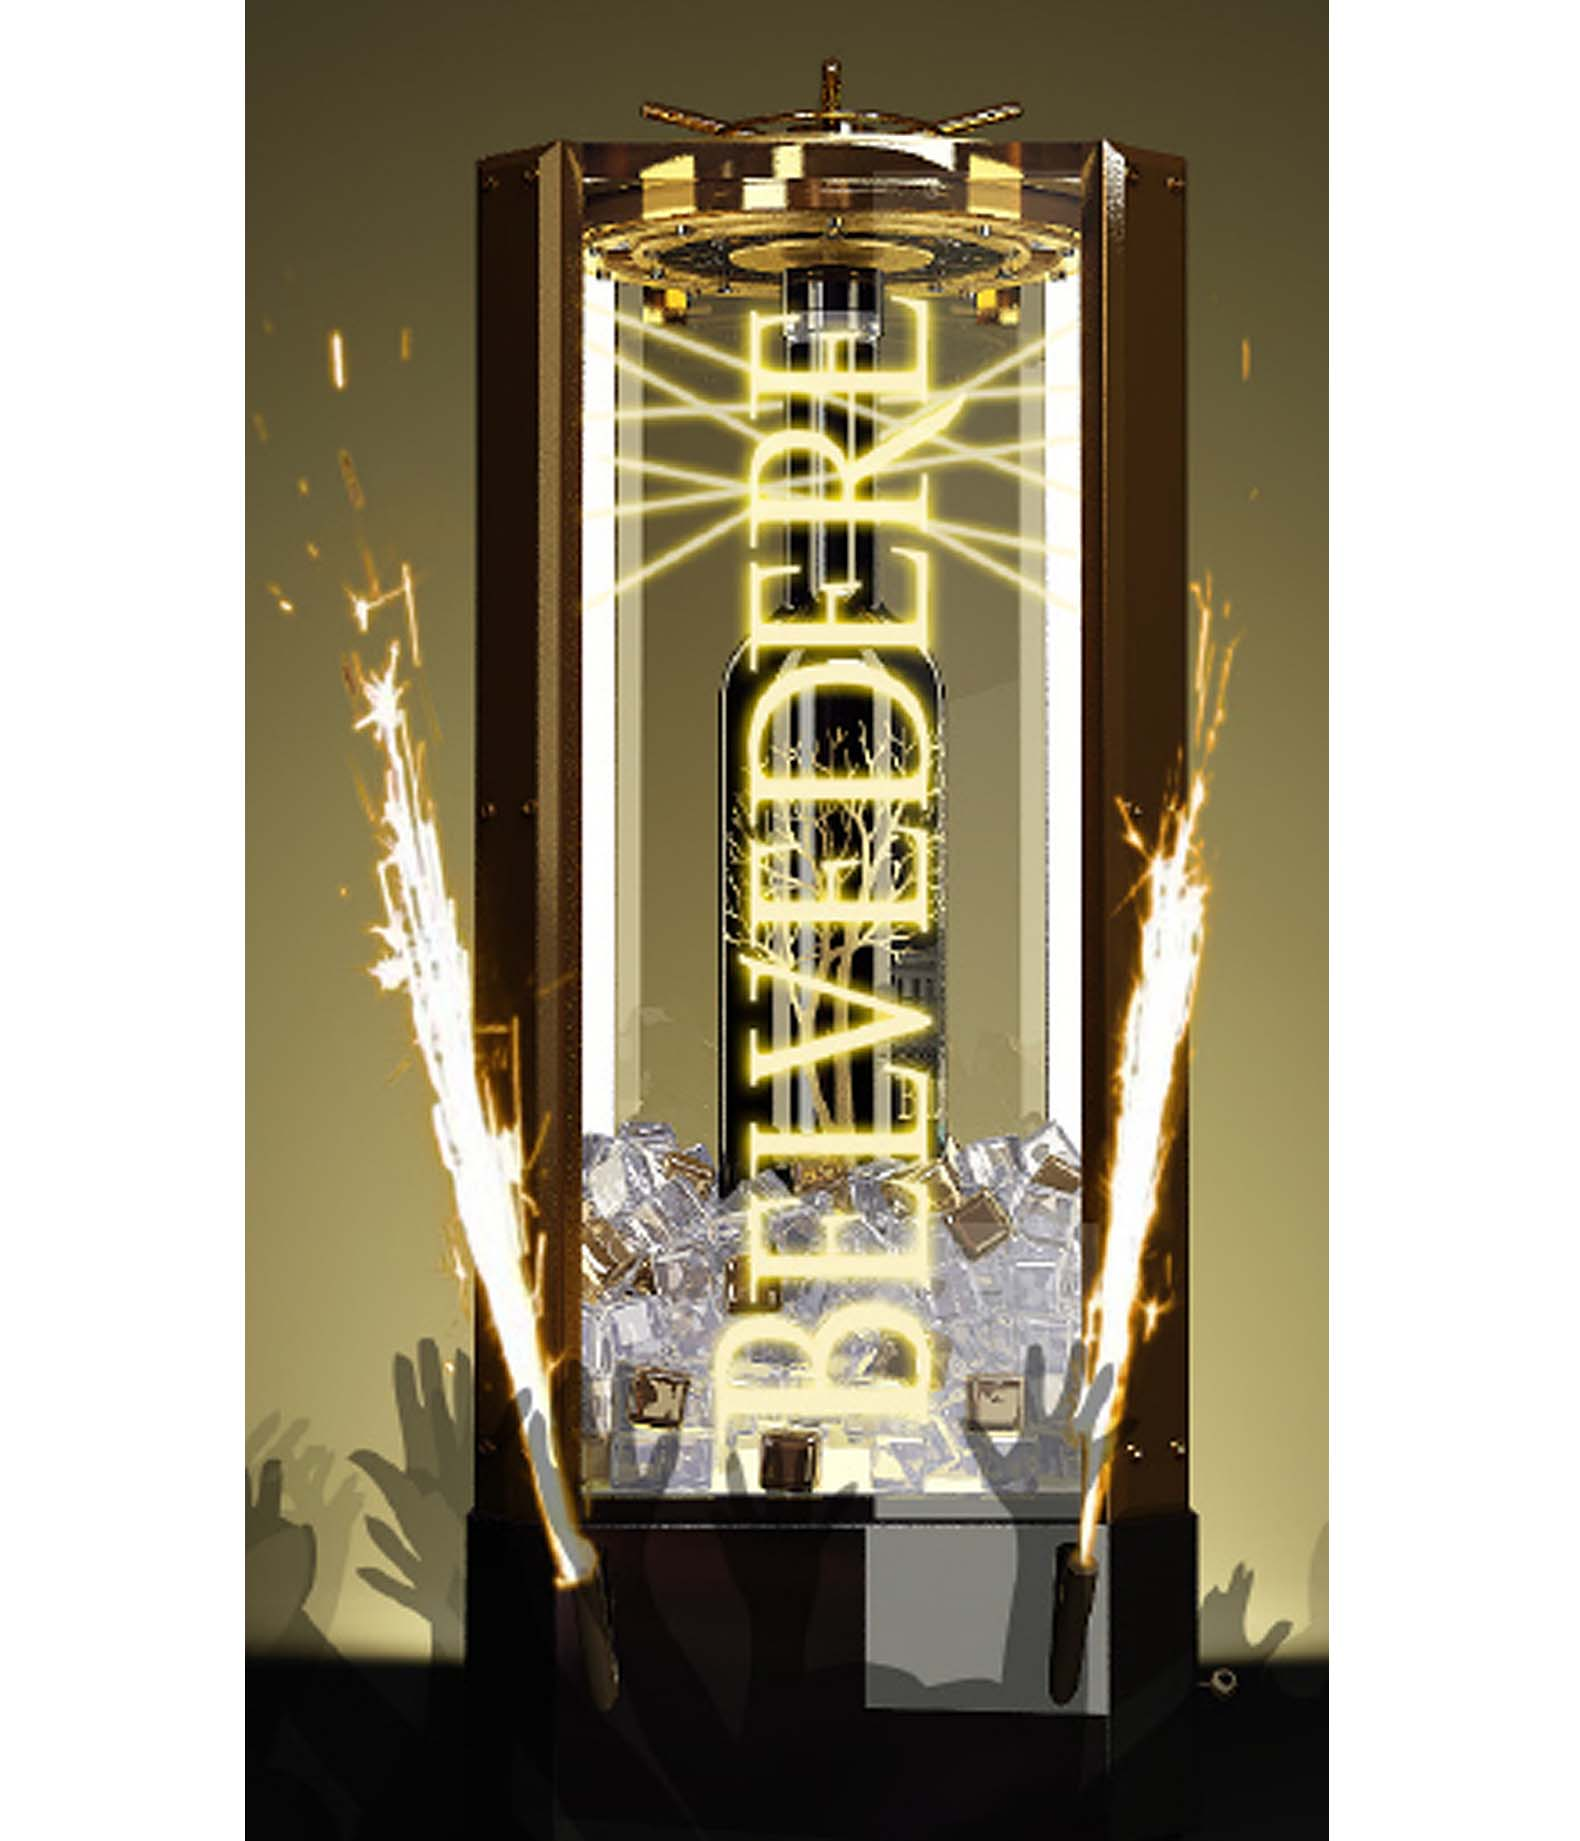 Bar Items - Illuminated Rotating Back-Bar/Ice Bucket